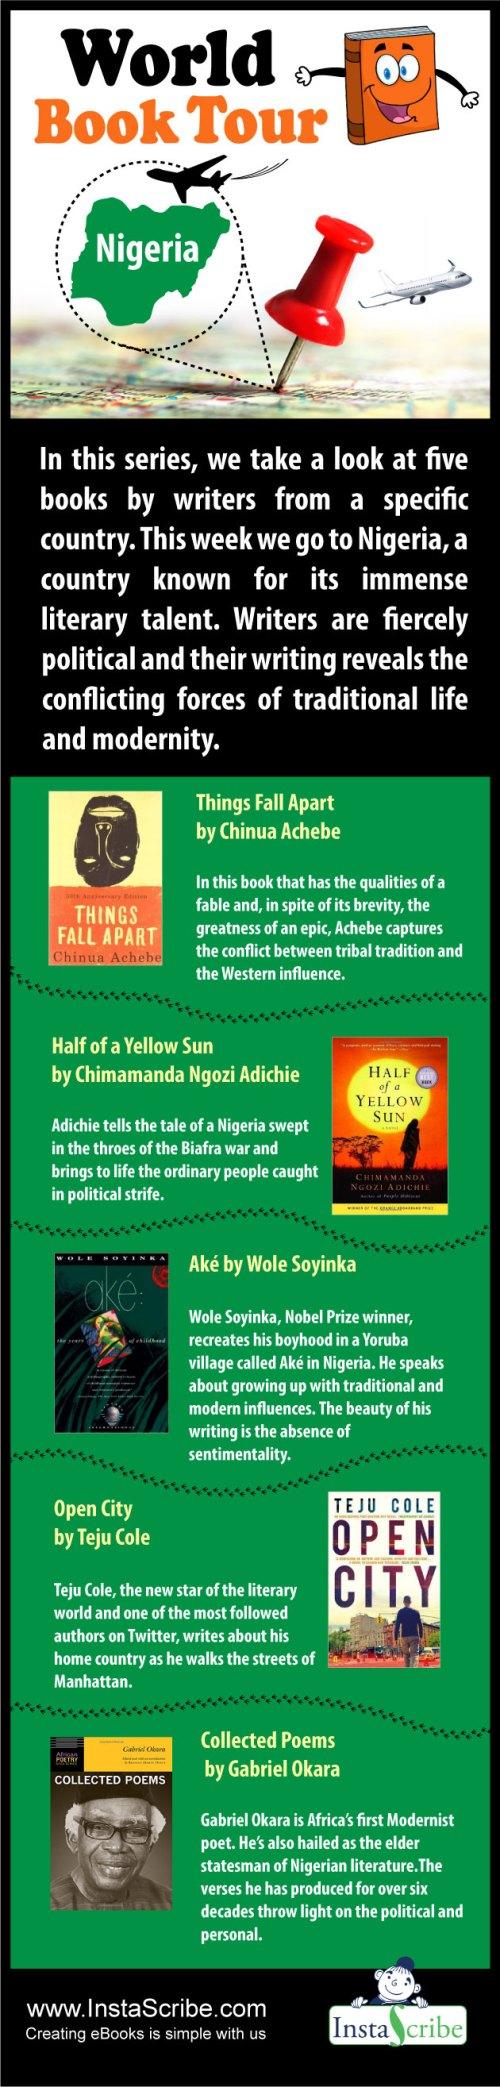 world-book-tour-nigeria-01